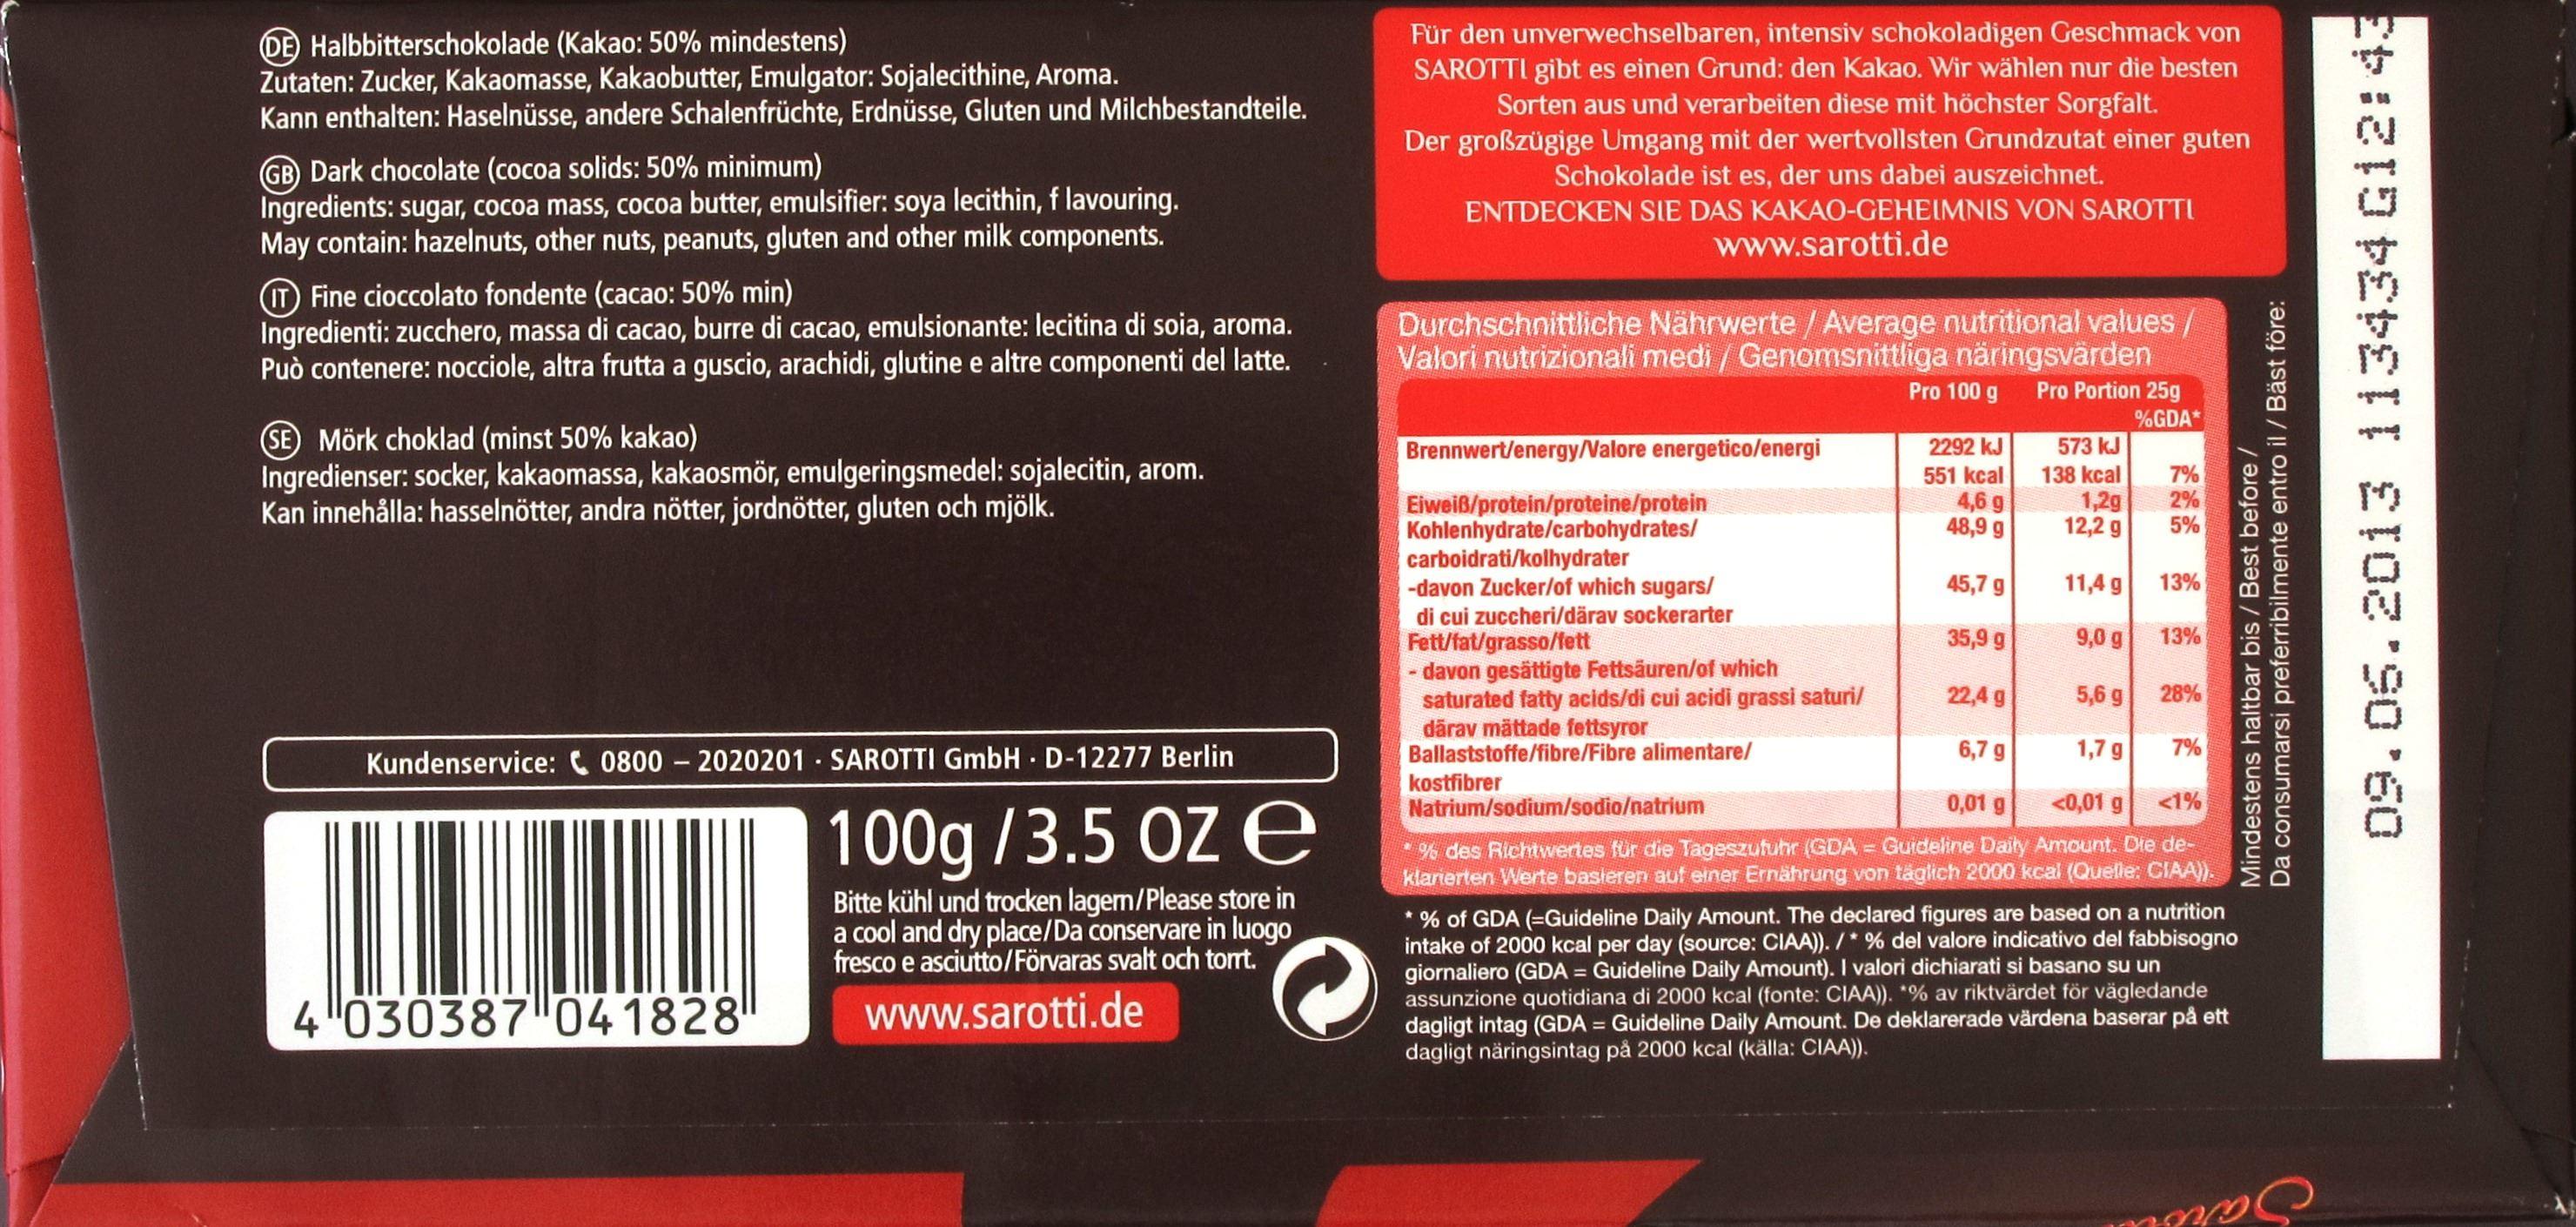 Sarotti Edel-Halbbitter Produktinformationen